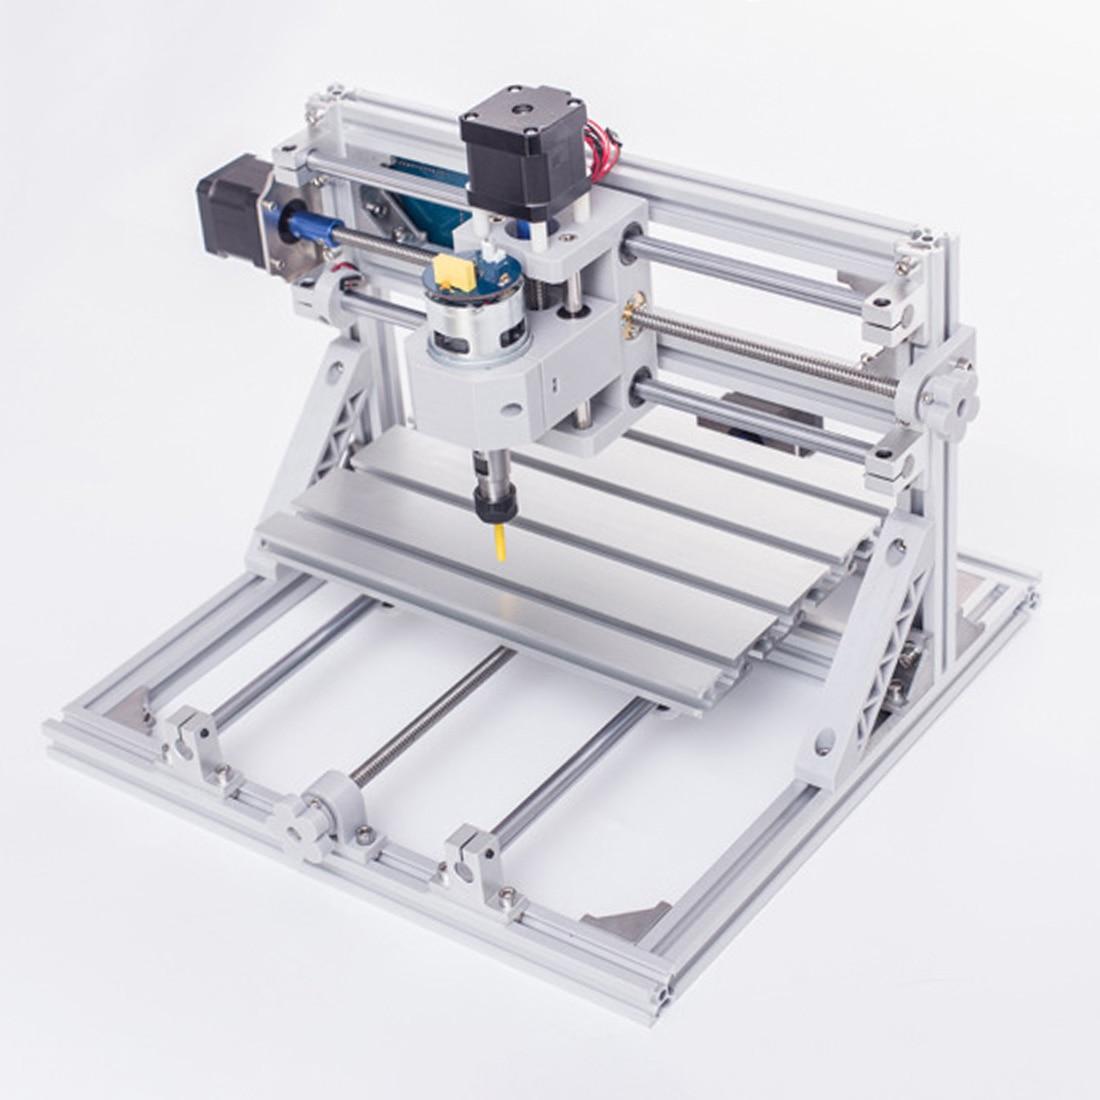 CNC 2418 AC110v ~ 220V GRBL Haushalt Schneiden Maschine 3 Achse Gravur Maschine Modell Experiment Wissenschaft Kits